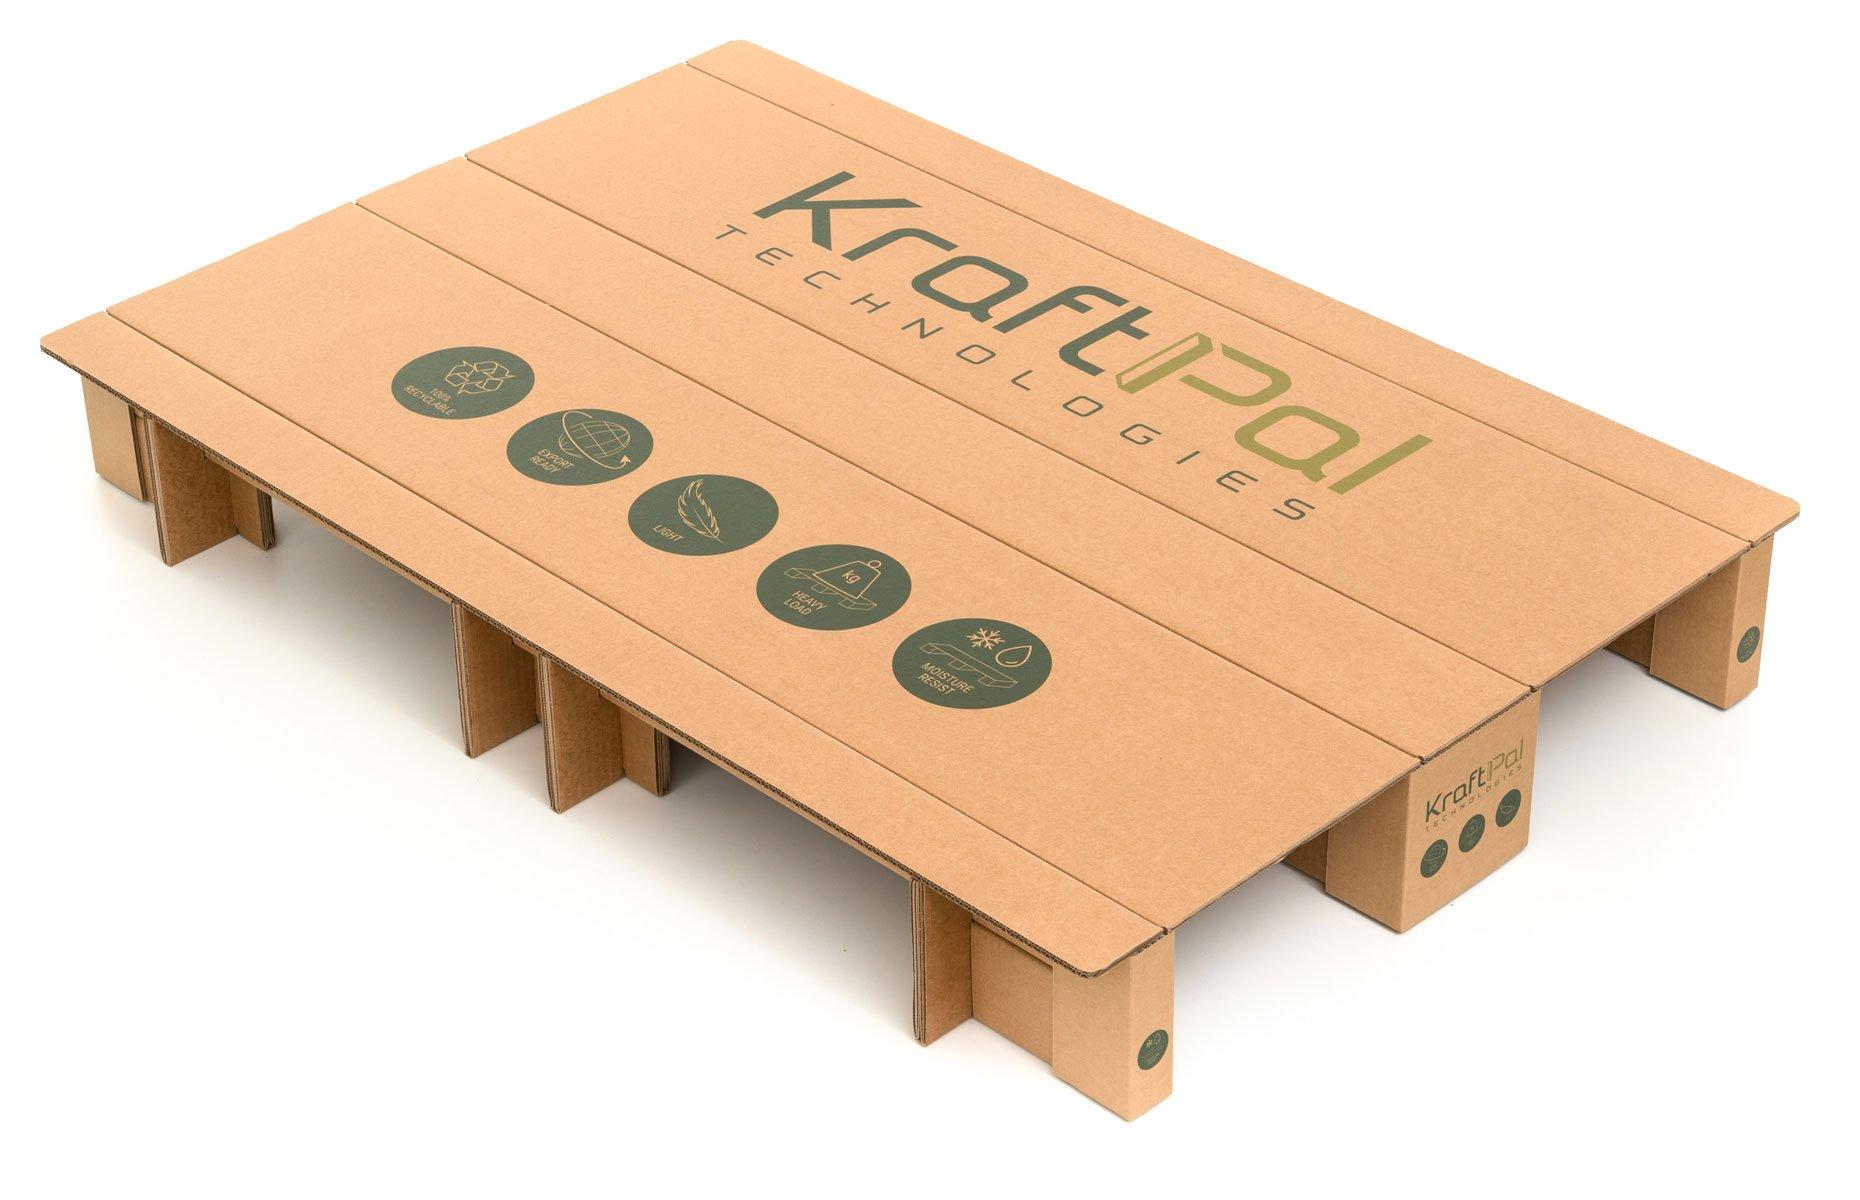 KraftPal-X-Pallet-LD-1.jpg